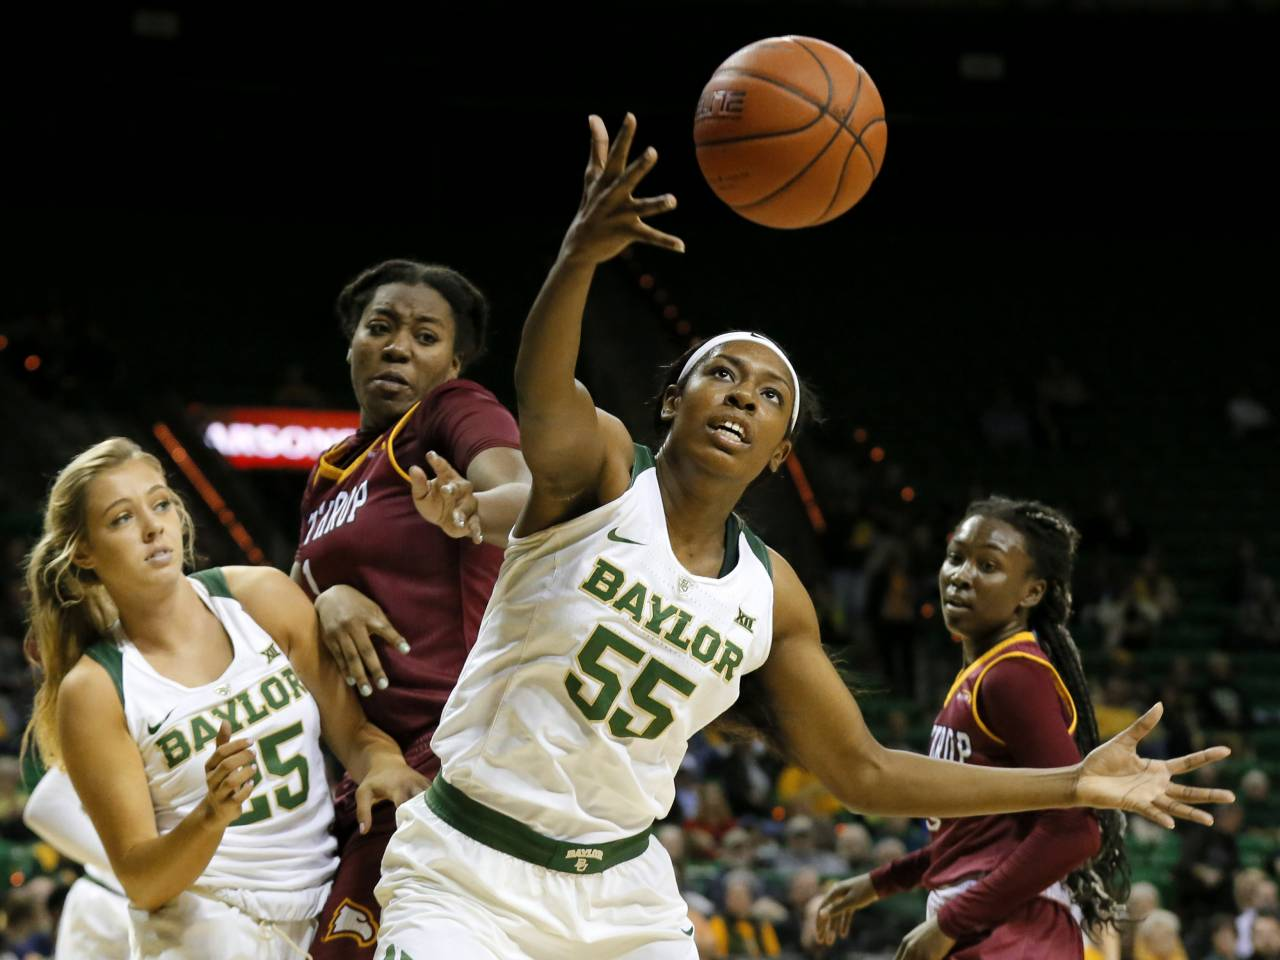 Biggest DI women's rout: No. 3 Baylor tops Winthrop 140-32